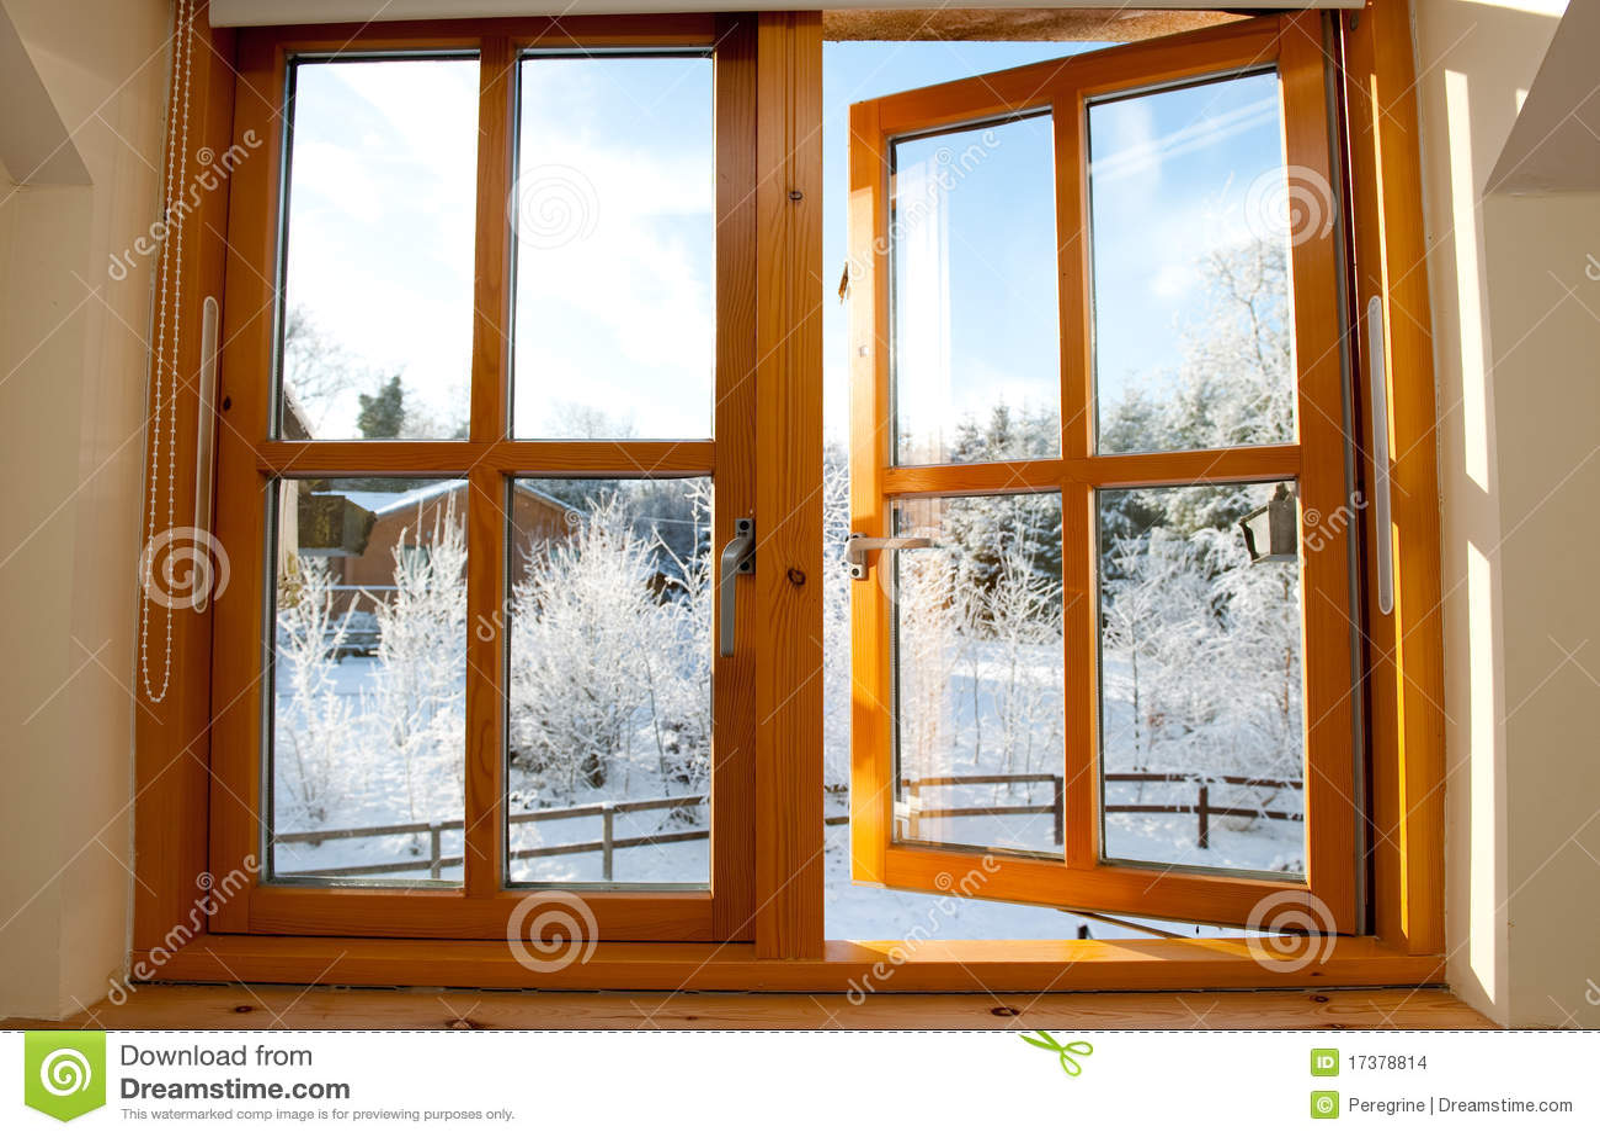 Double Glazed Wooden Window Stock Photo